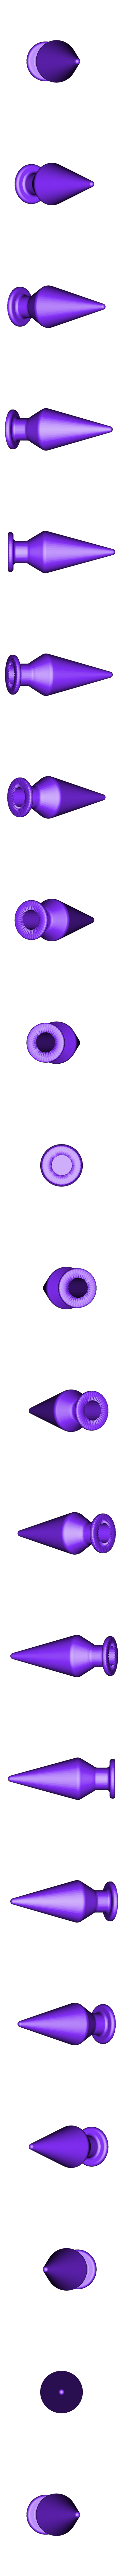 GL-butt-plug-modified-small.stl Download free STL file Free Butt Plugs • 3D printable design, Dildo3D